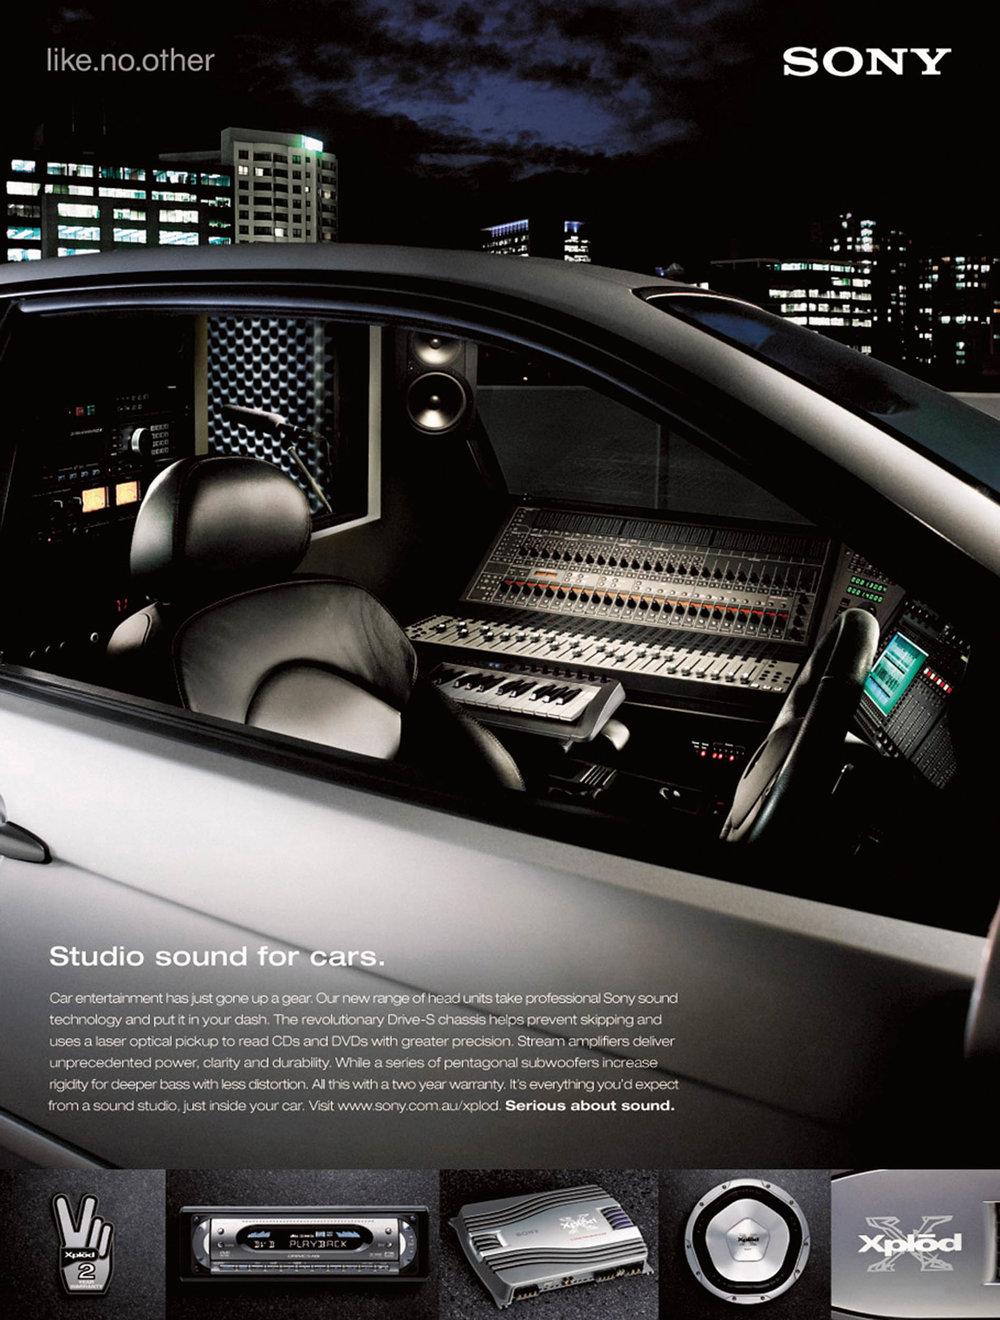 Sony_car.jpg